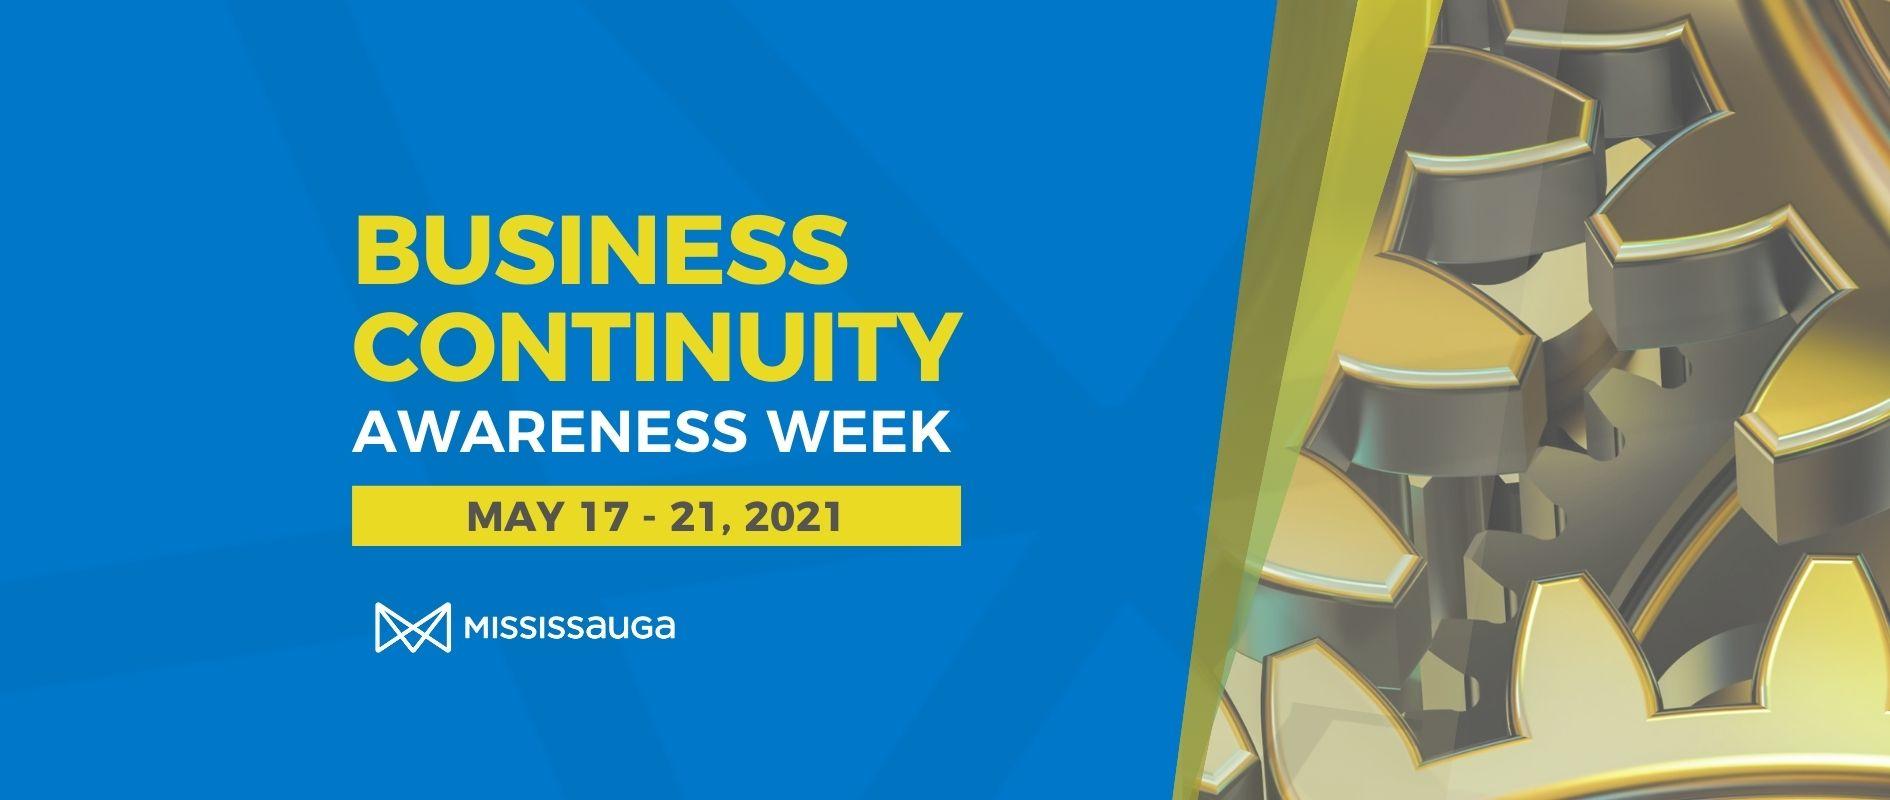 Business Continuity Awareness Week 2021